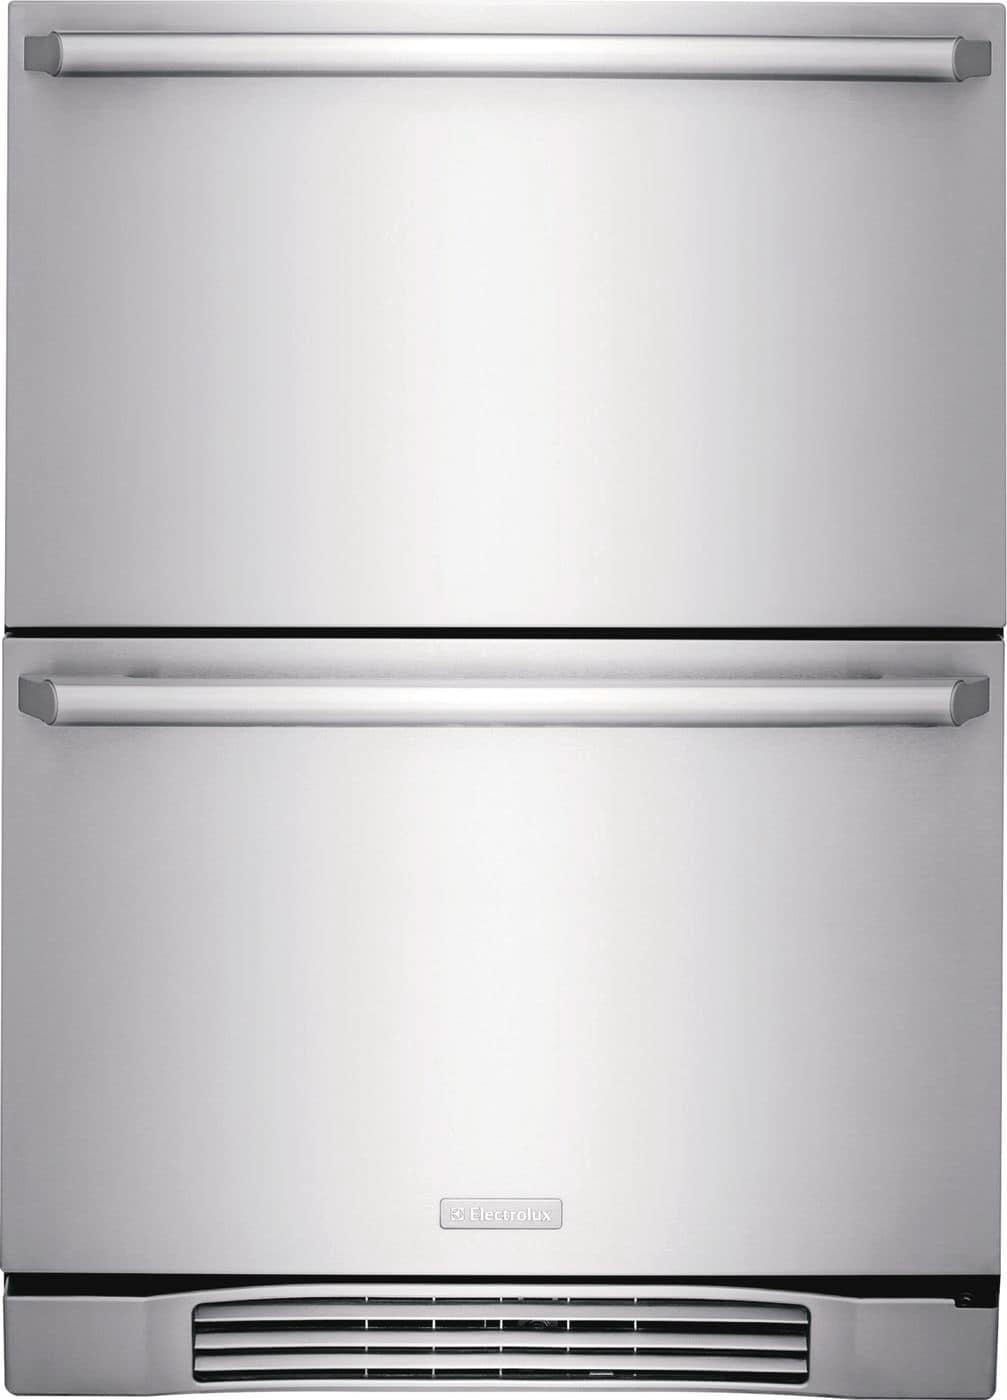 "Electrolux 24"" Refrigerator Drawers"